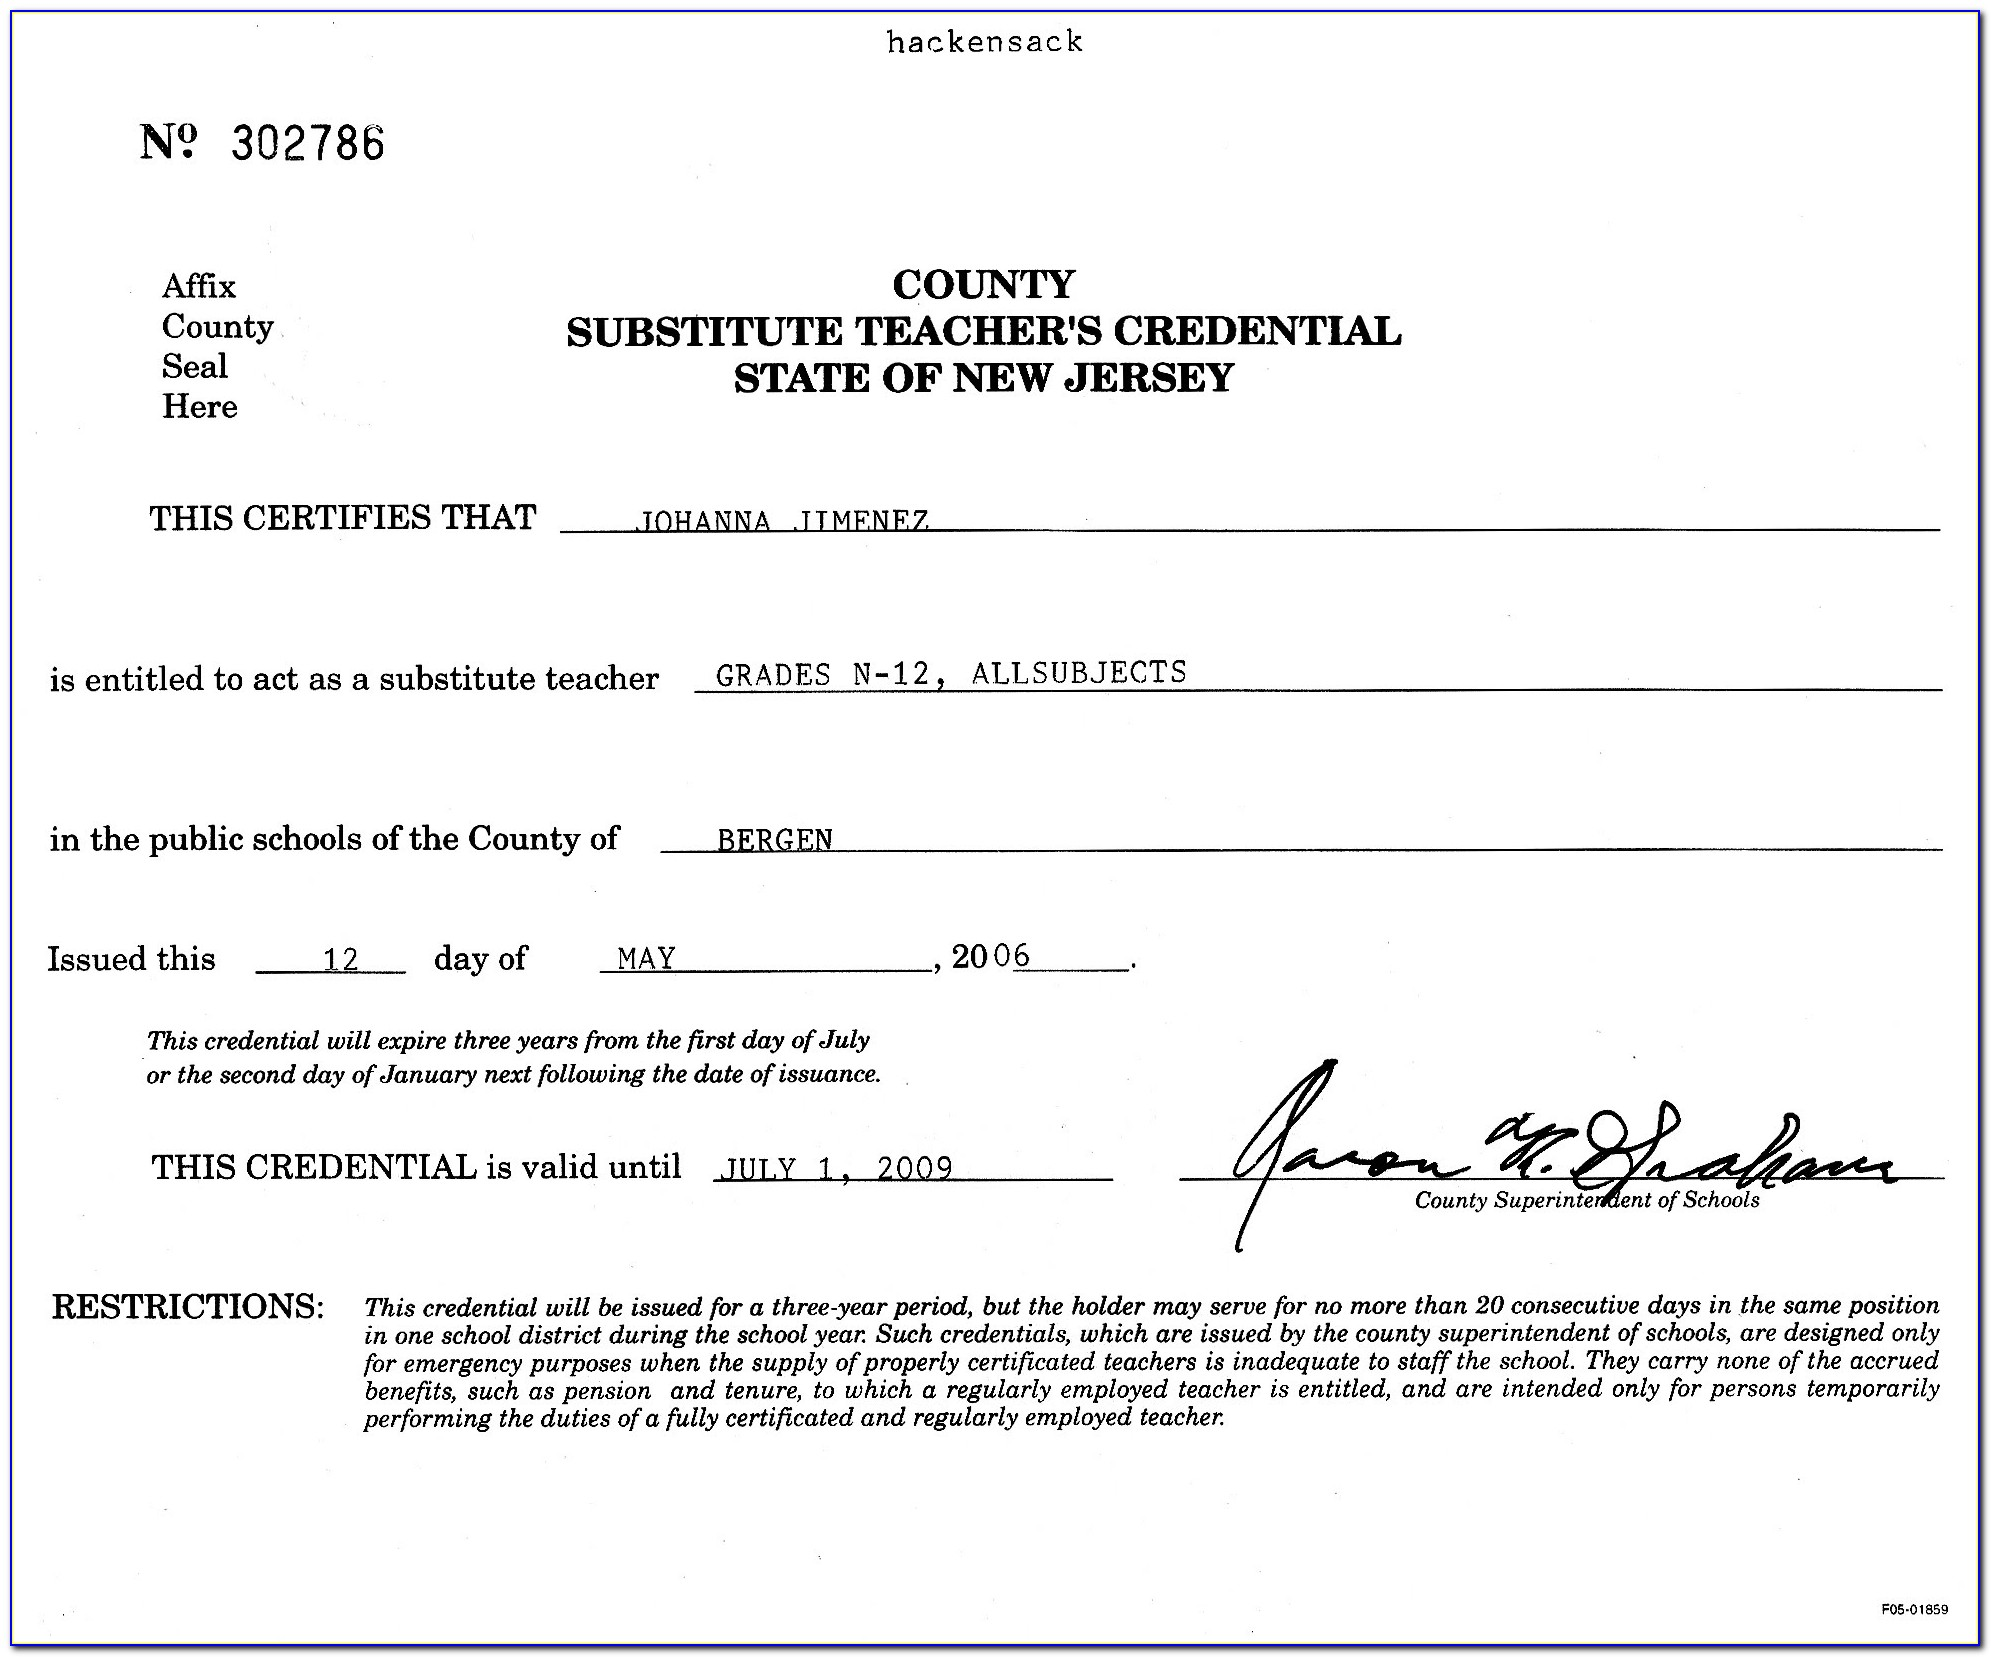 Uw Madison Certificate In Business